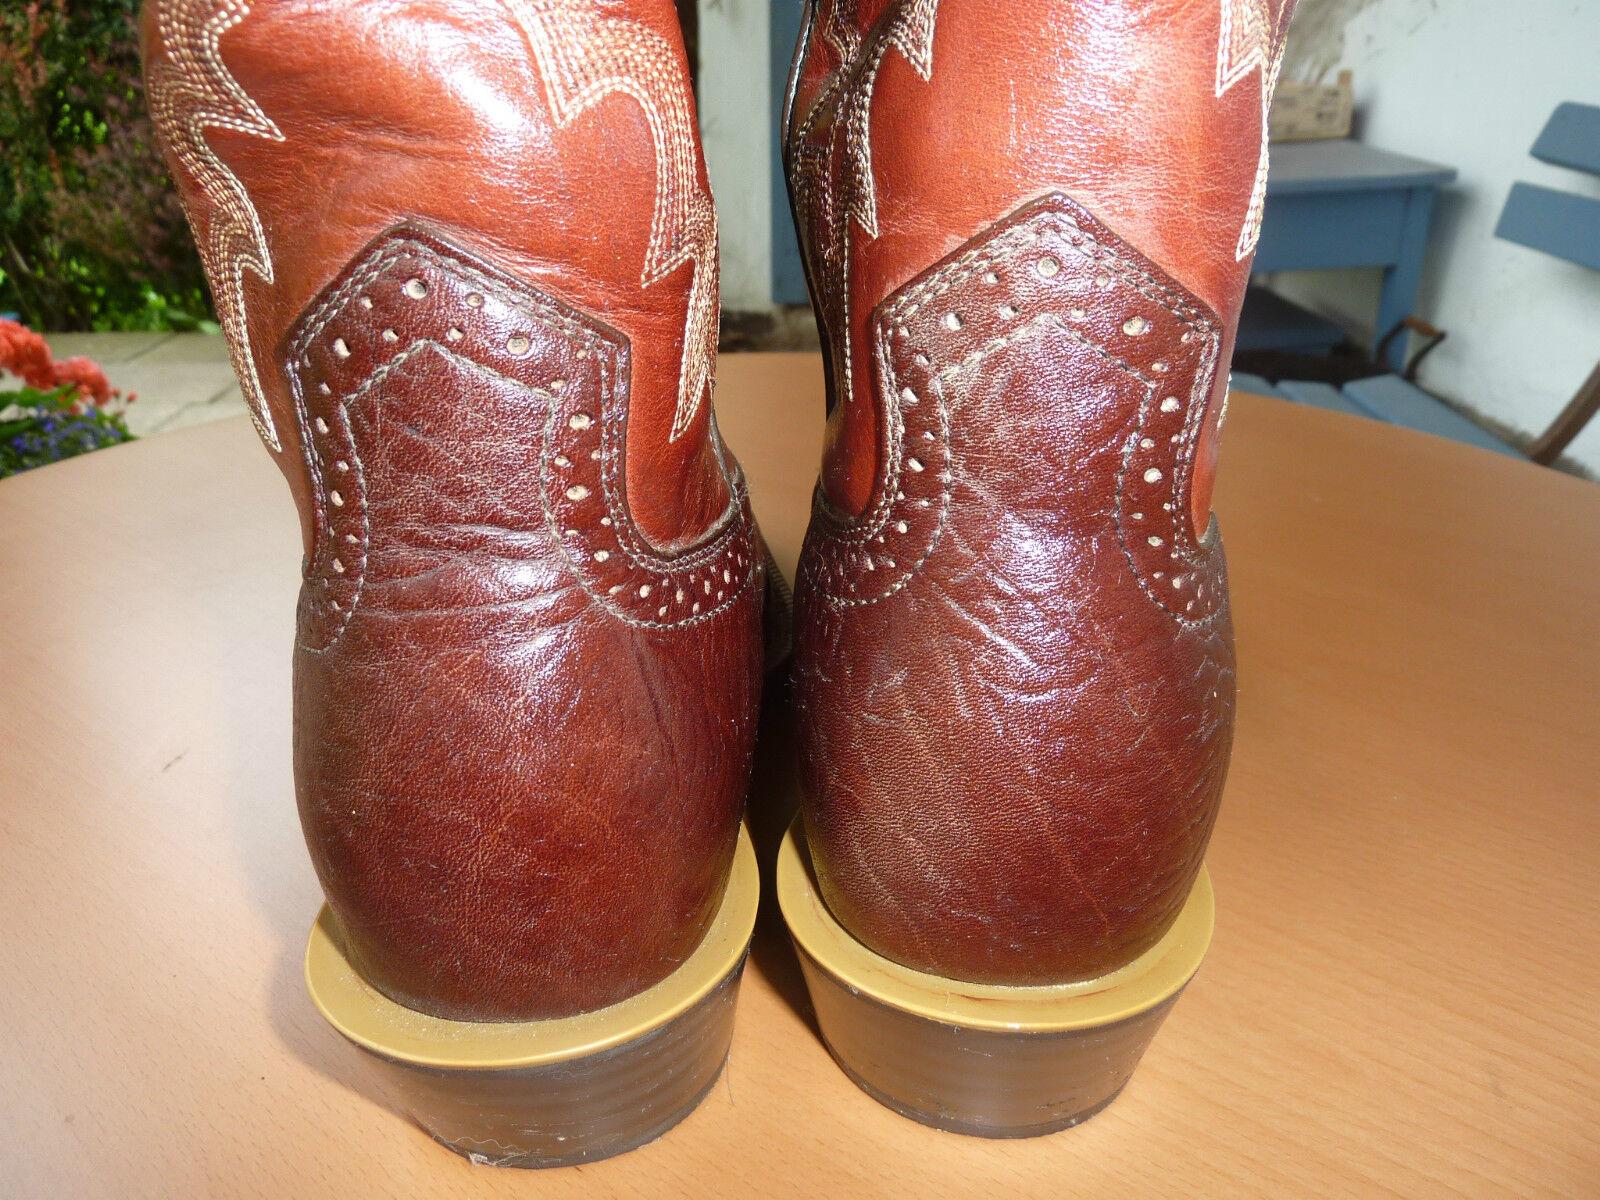 NEUwertige fantastische fantastische NEUwertige TWISTED Stiefel,Westernstiefel, Gr.41,HOHE QUALITÄT 5b6edd